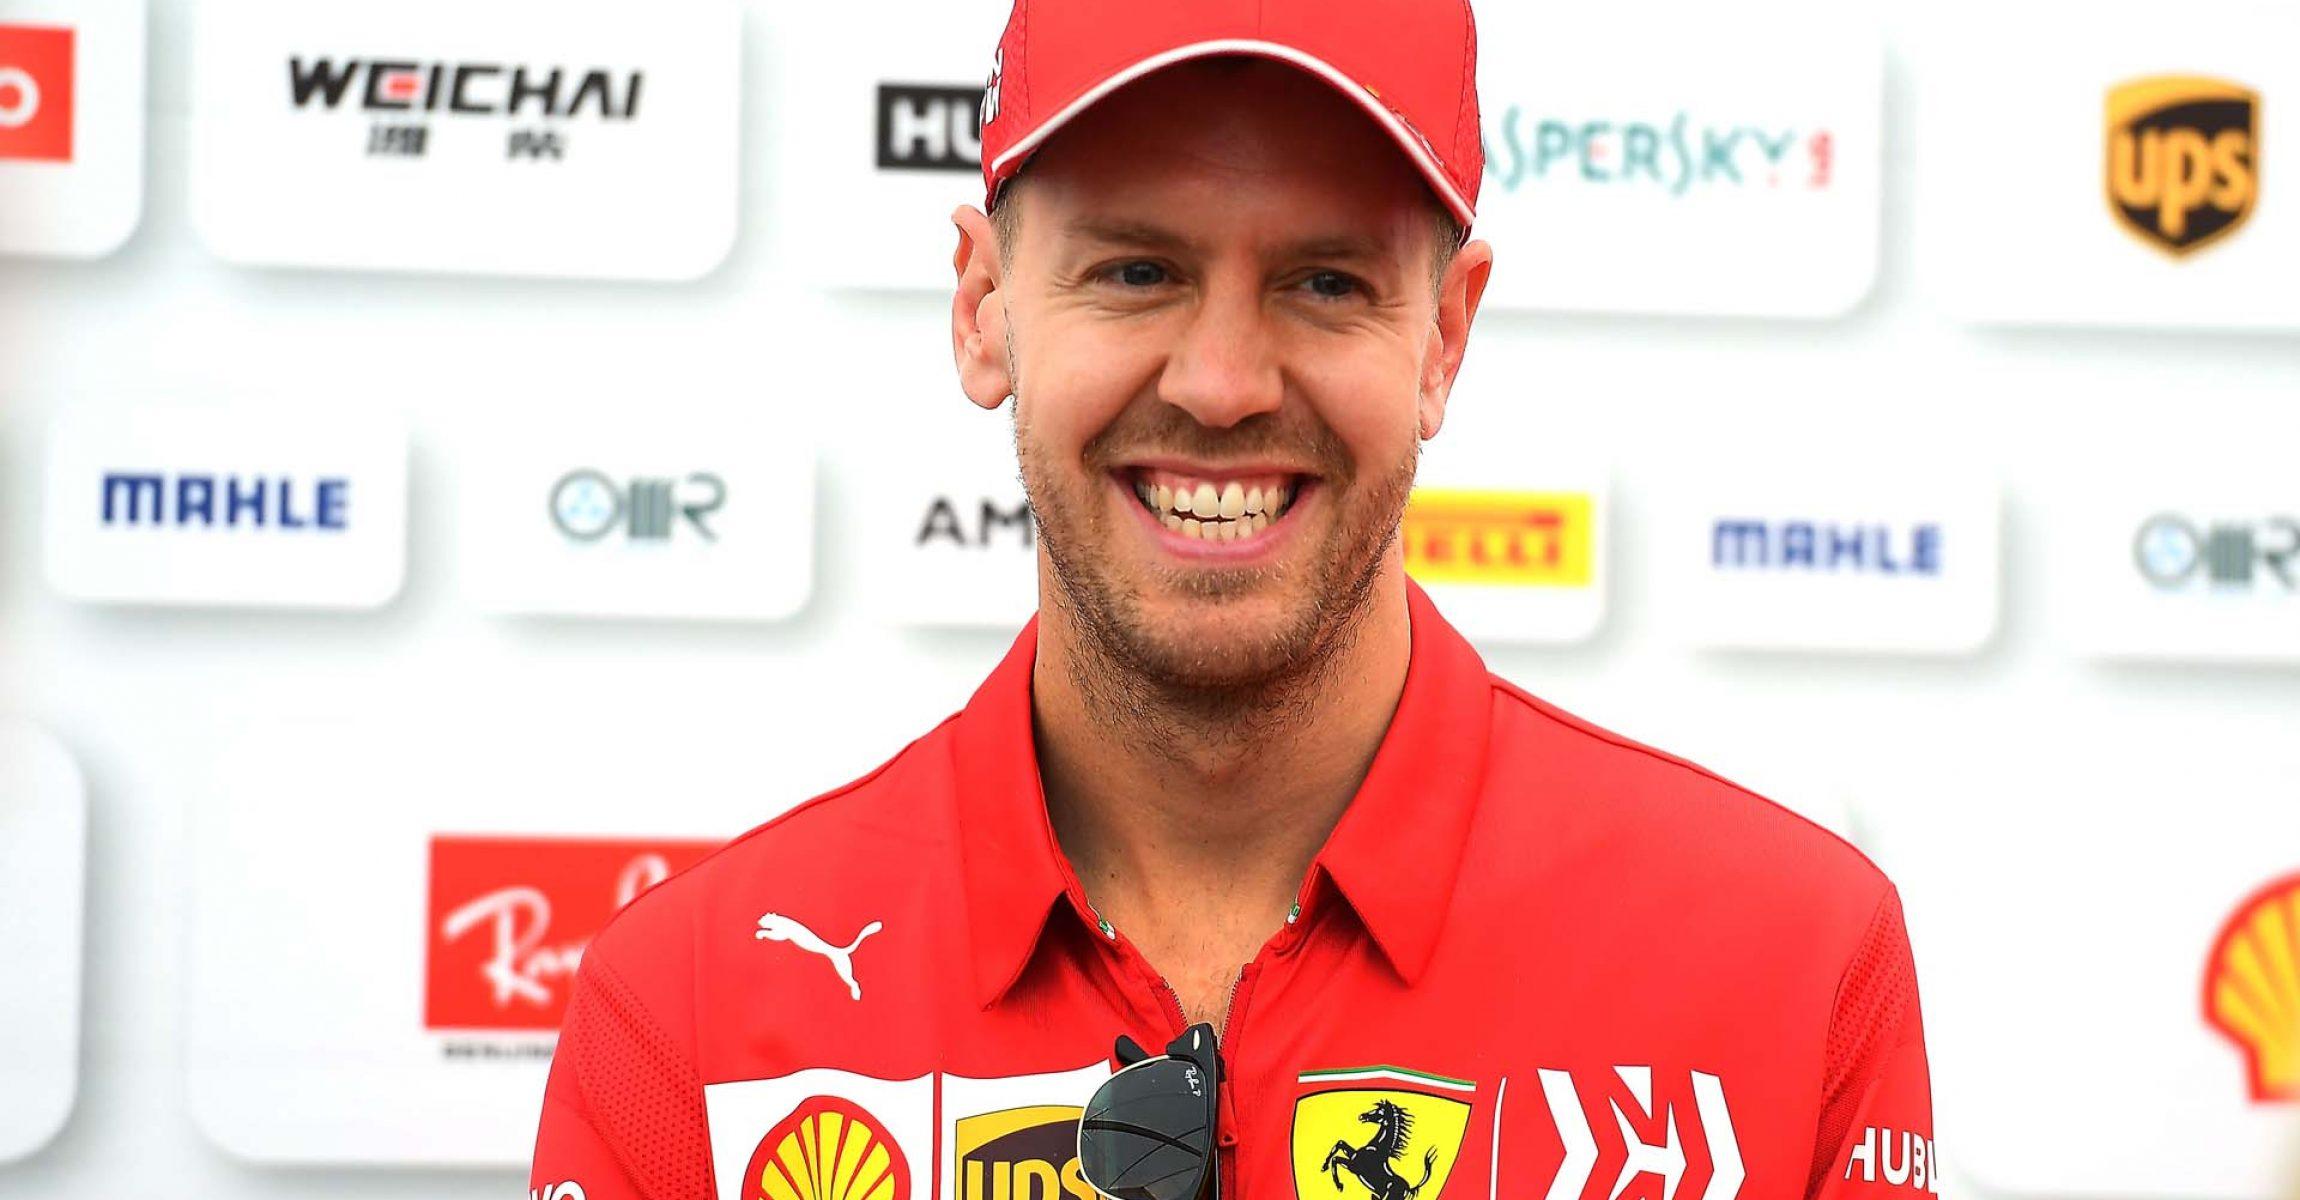 GP GIAPPONE F1/2019 - GIOVEDÌ 10/10/2019 credit: @Scuderia Ferrari Press Office Sebastian Vettel